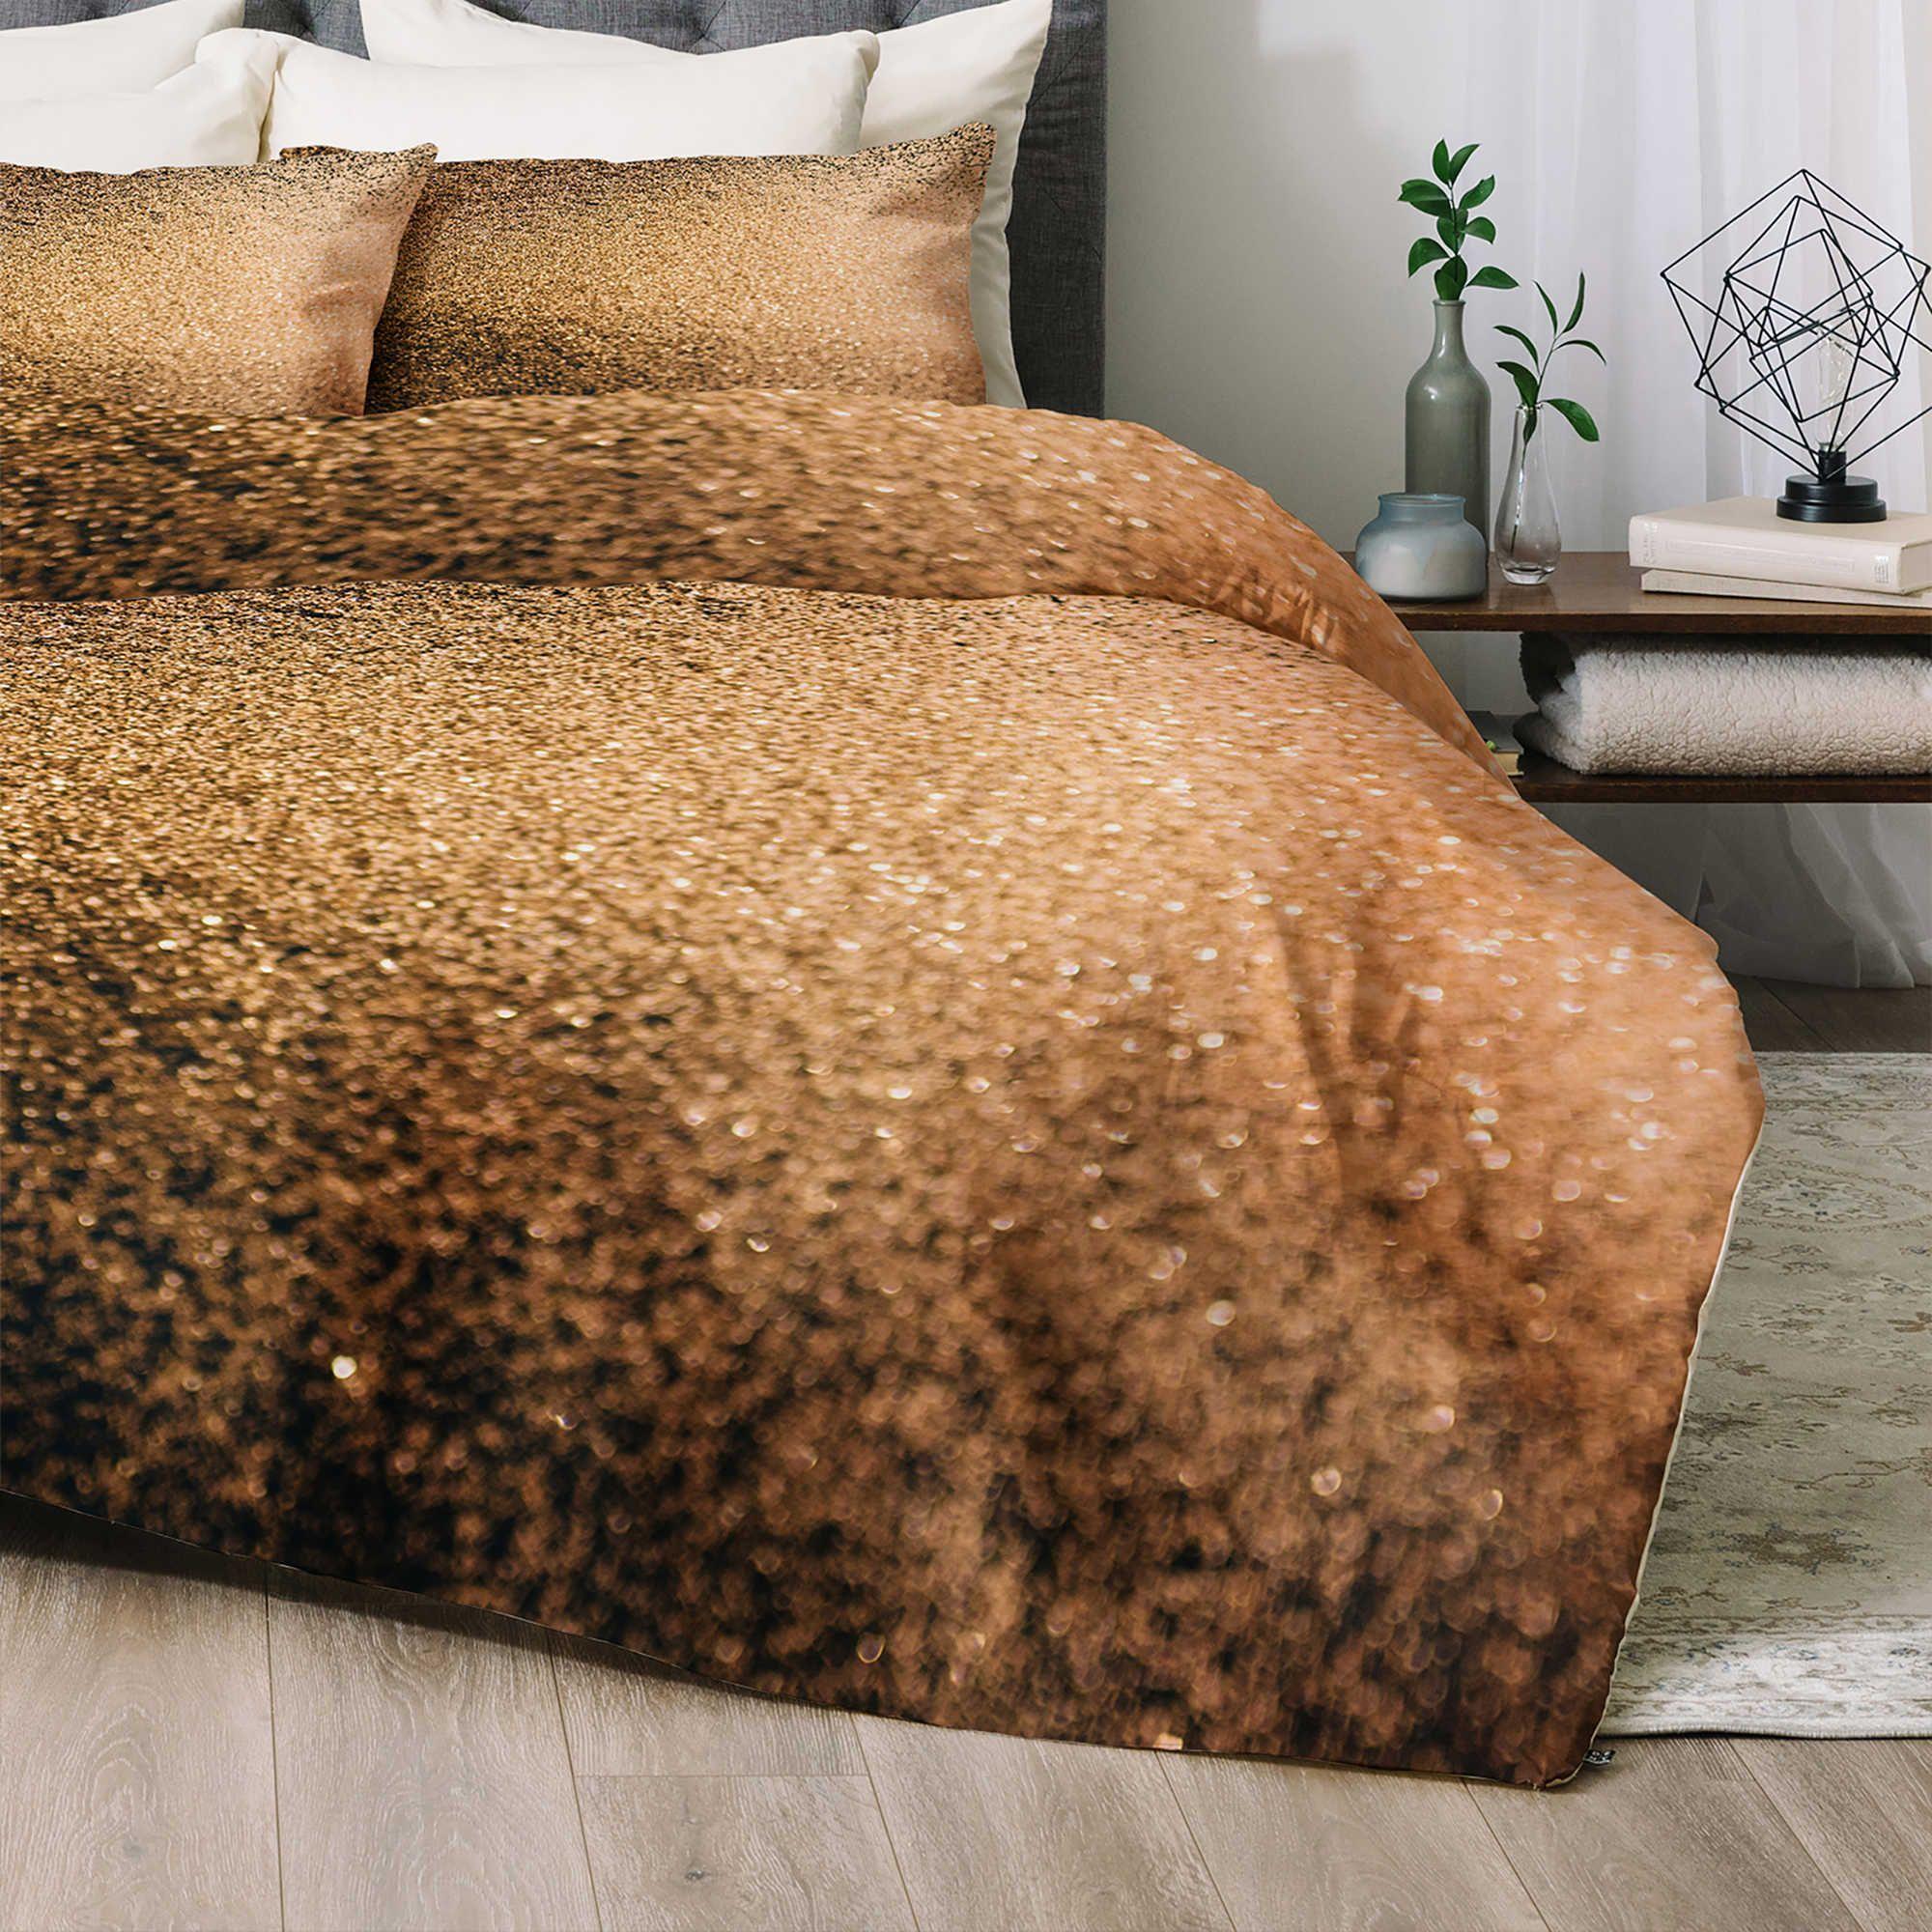 Deny Designs Chelsea Victoria Gold Dust King Comforter Set